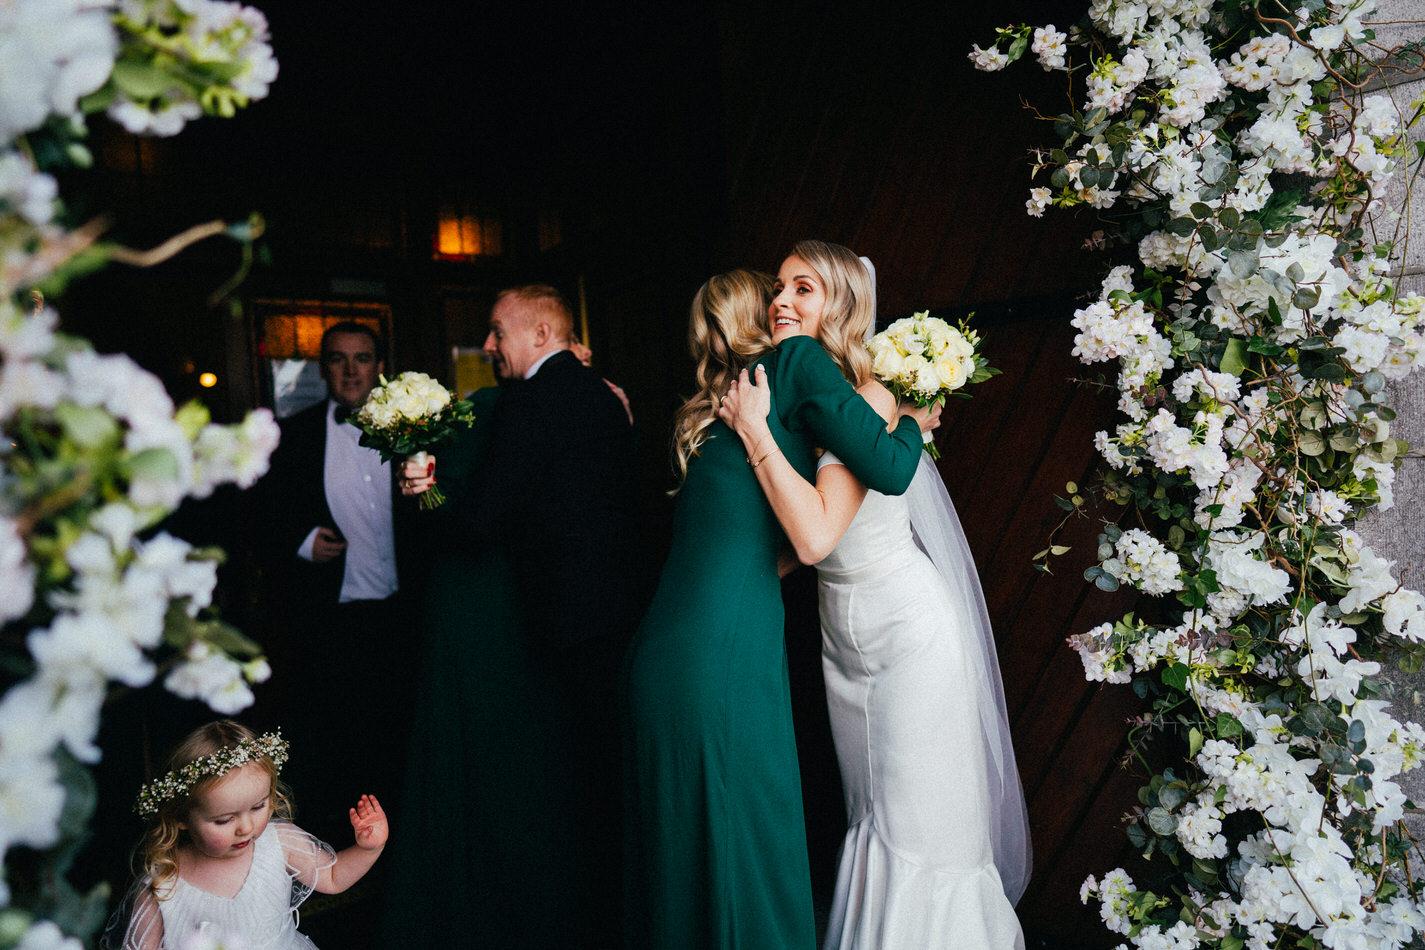 Castle-wedding-ireland-photos- 0153 105